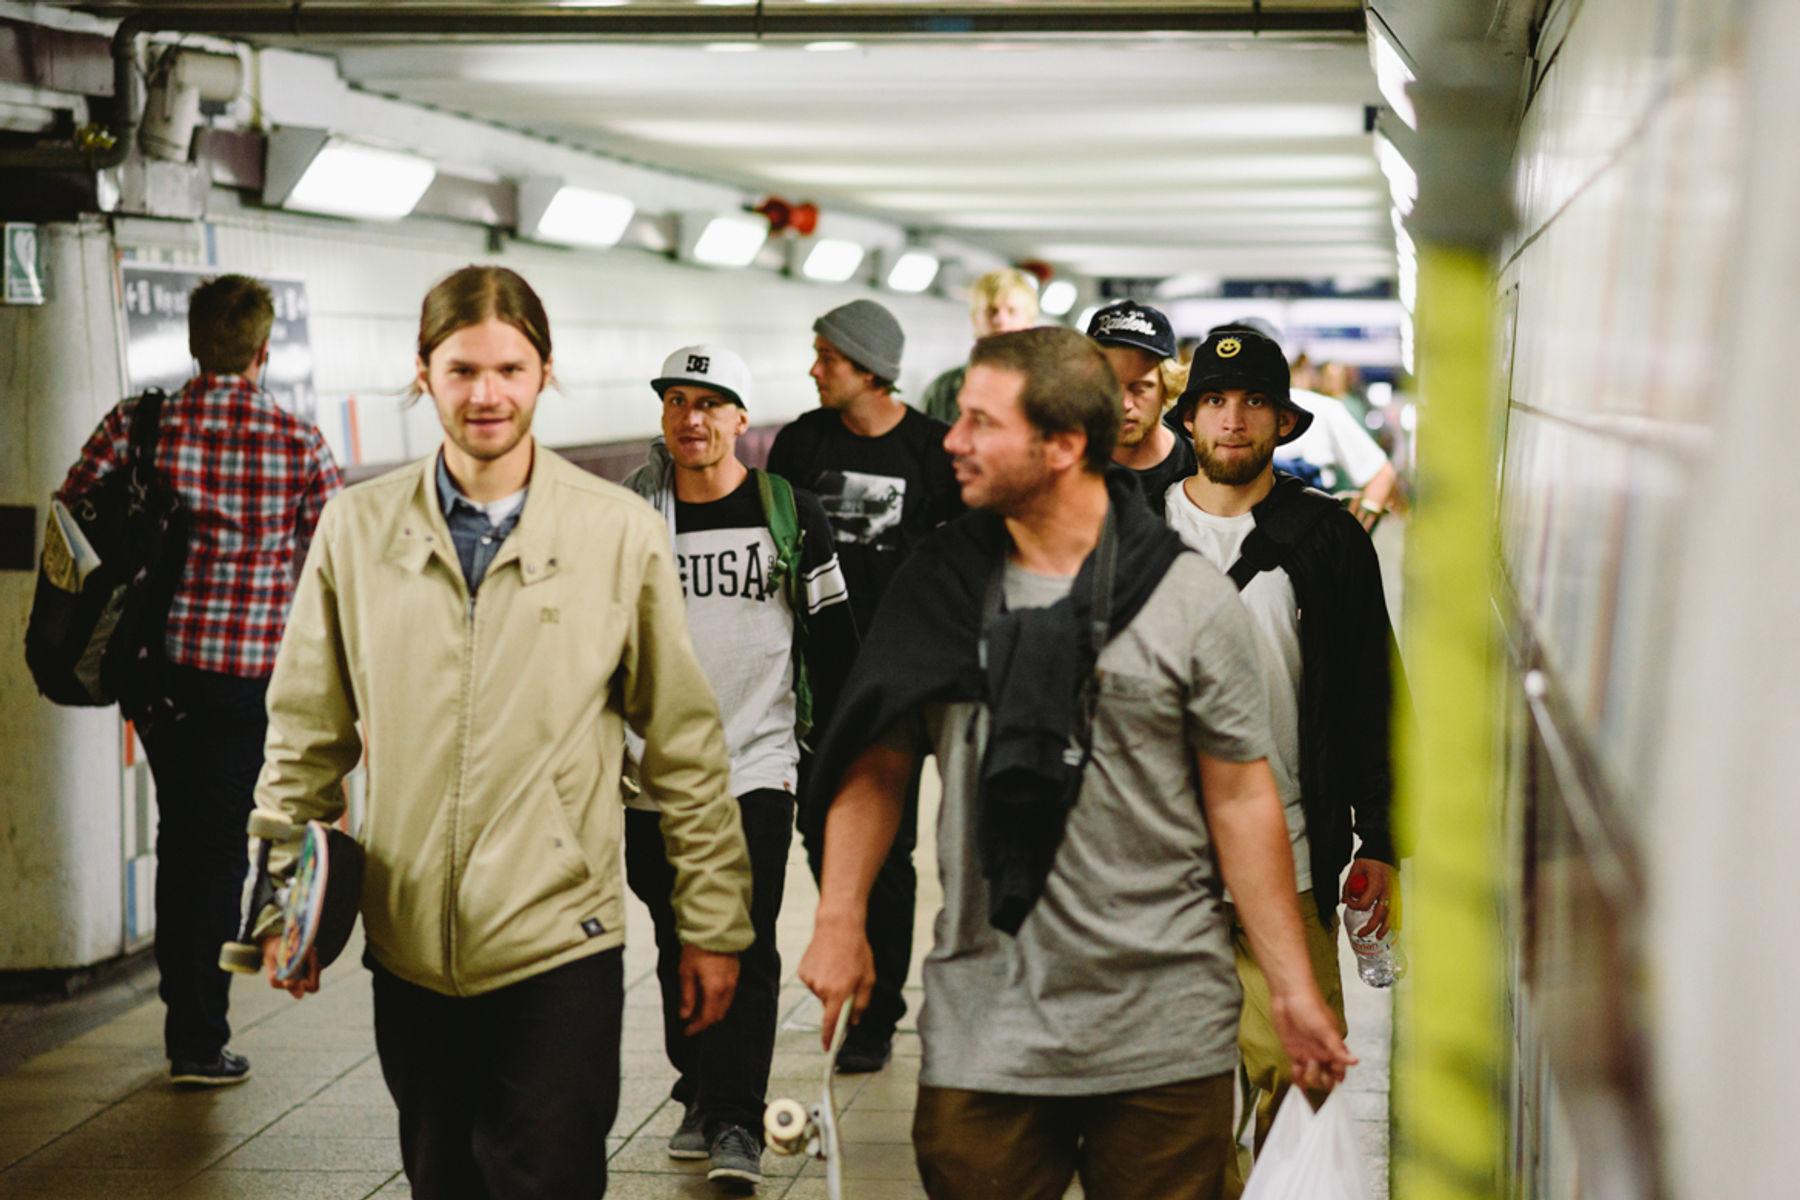 _IHC3036e-Gosha-Konyshev-Antony-Lopez-Wes-Kremer-DC-Special-Delivery-Skate-Tour-BTS-London-May-2015-Photographer-Maksim-Kalanep